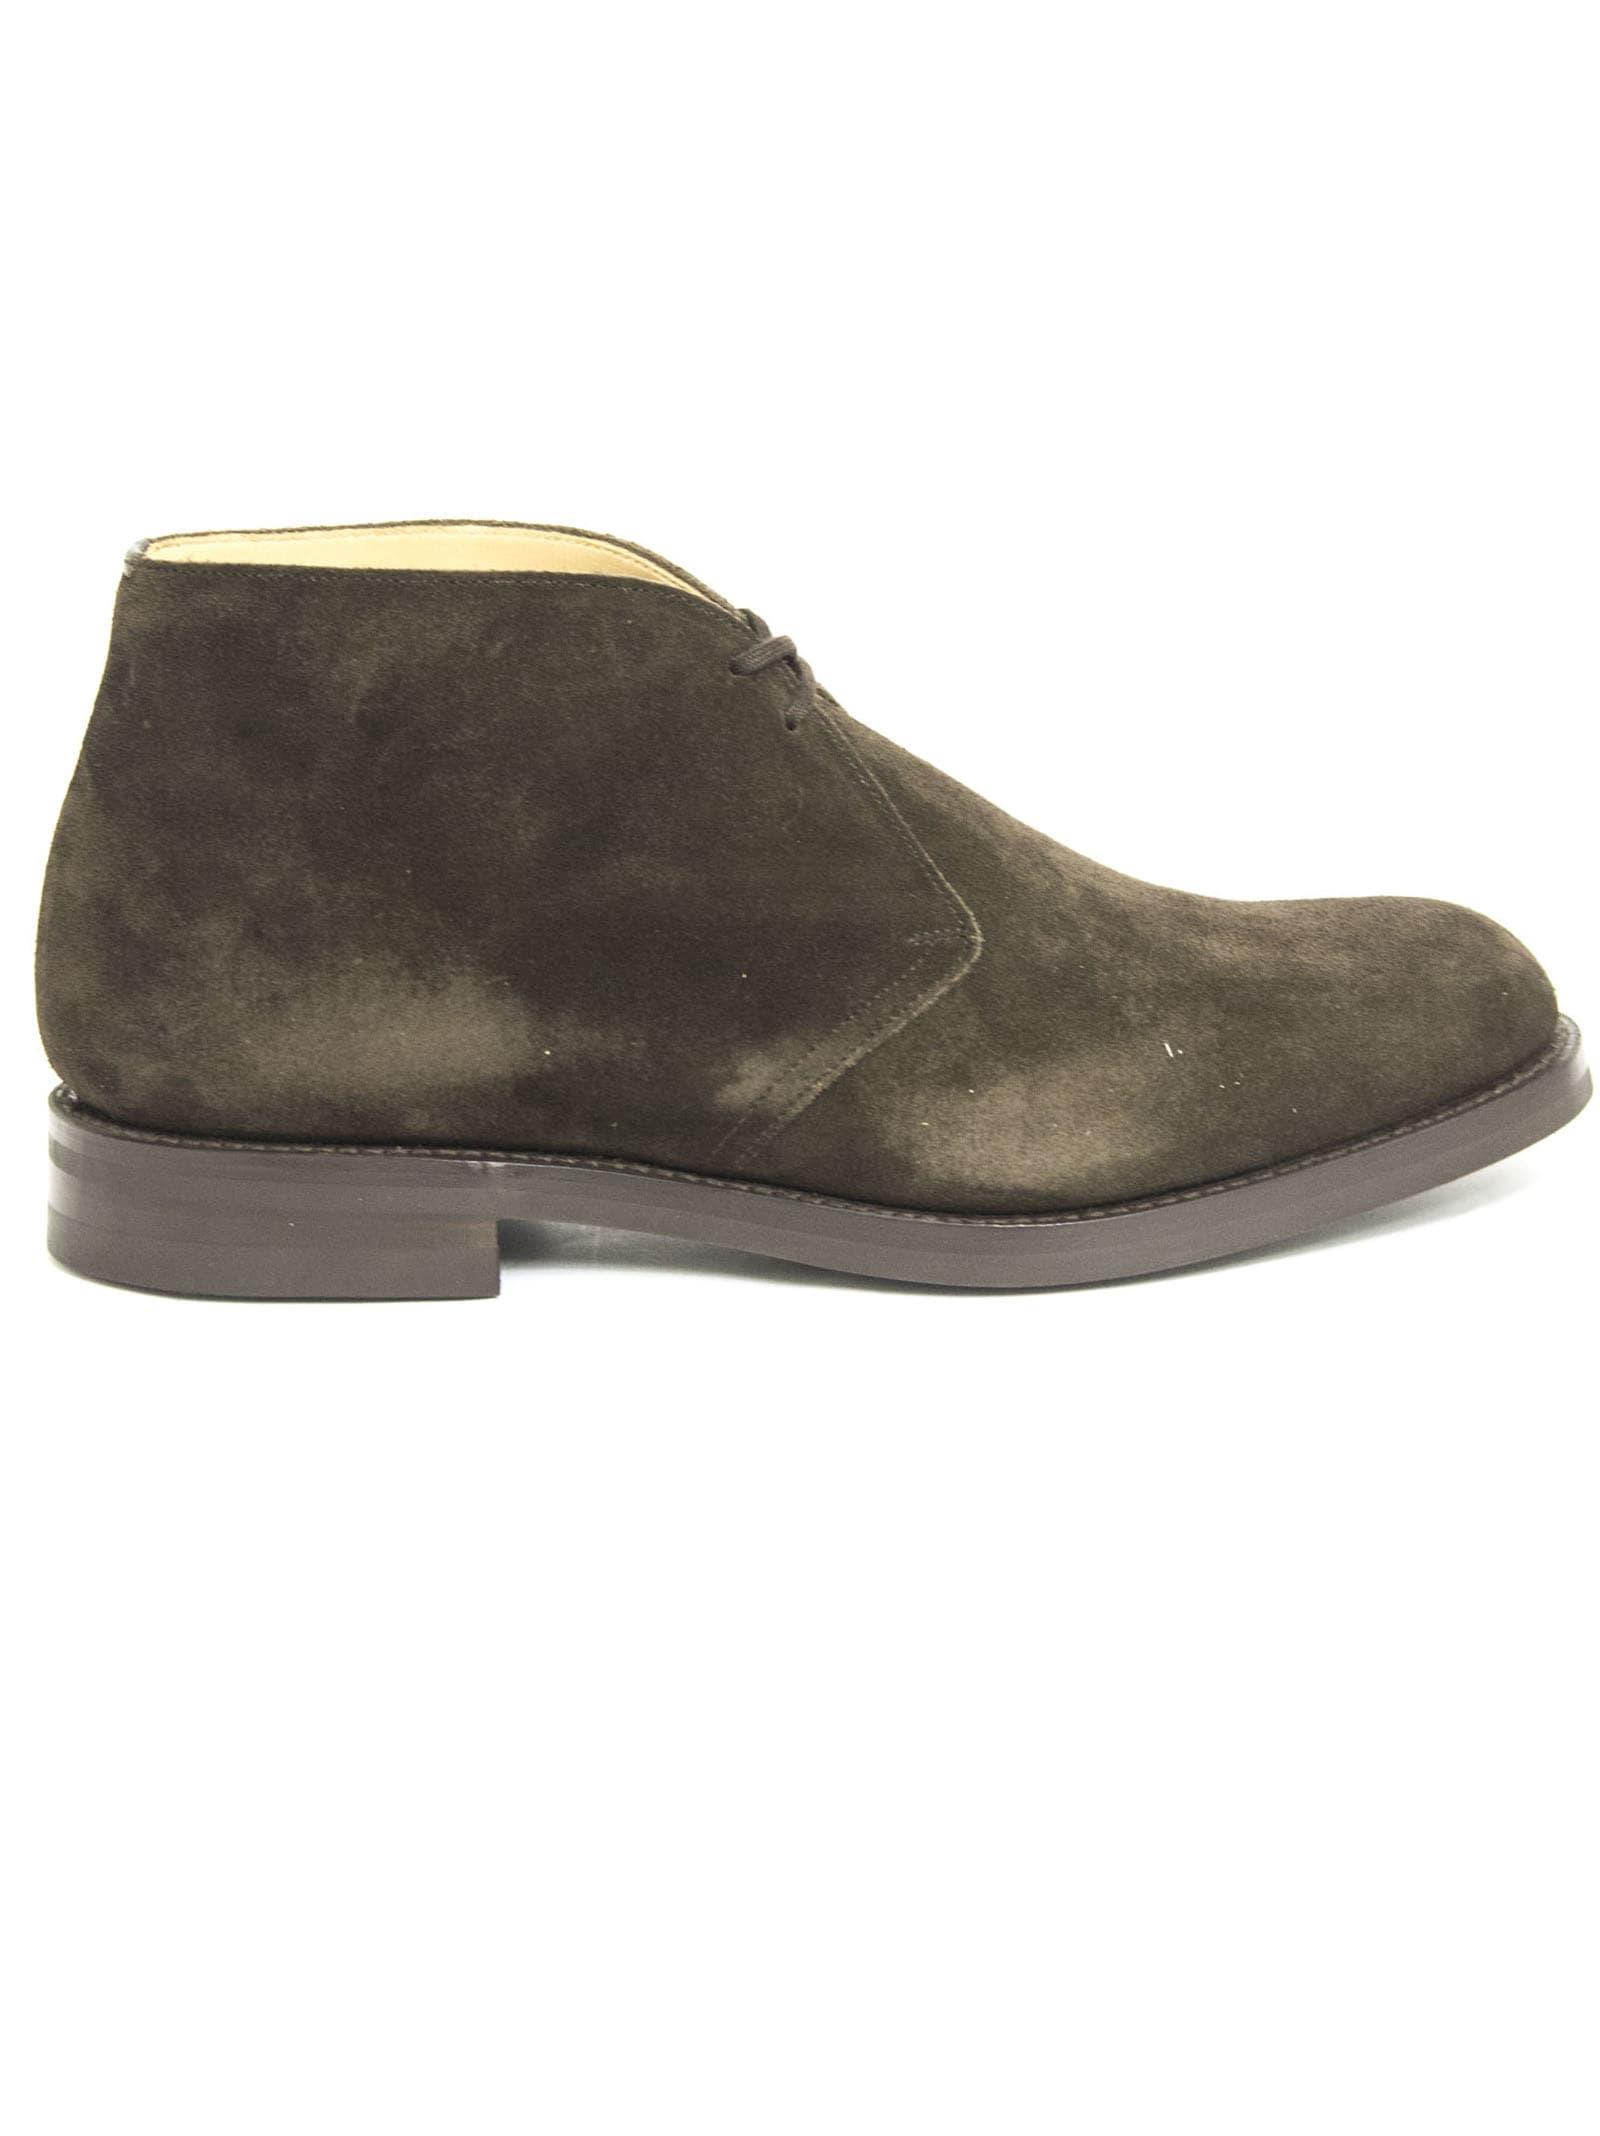 Churchs Ryder 3 Brown Suede Desert Boot